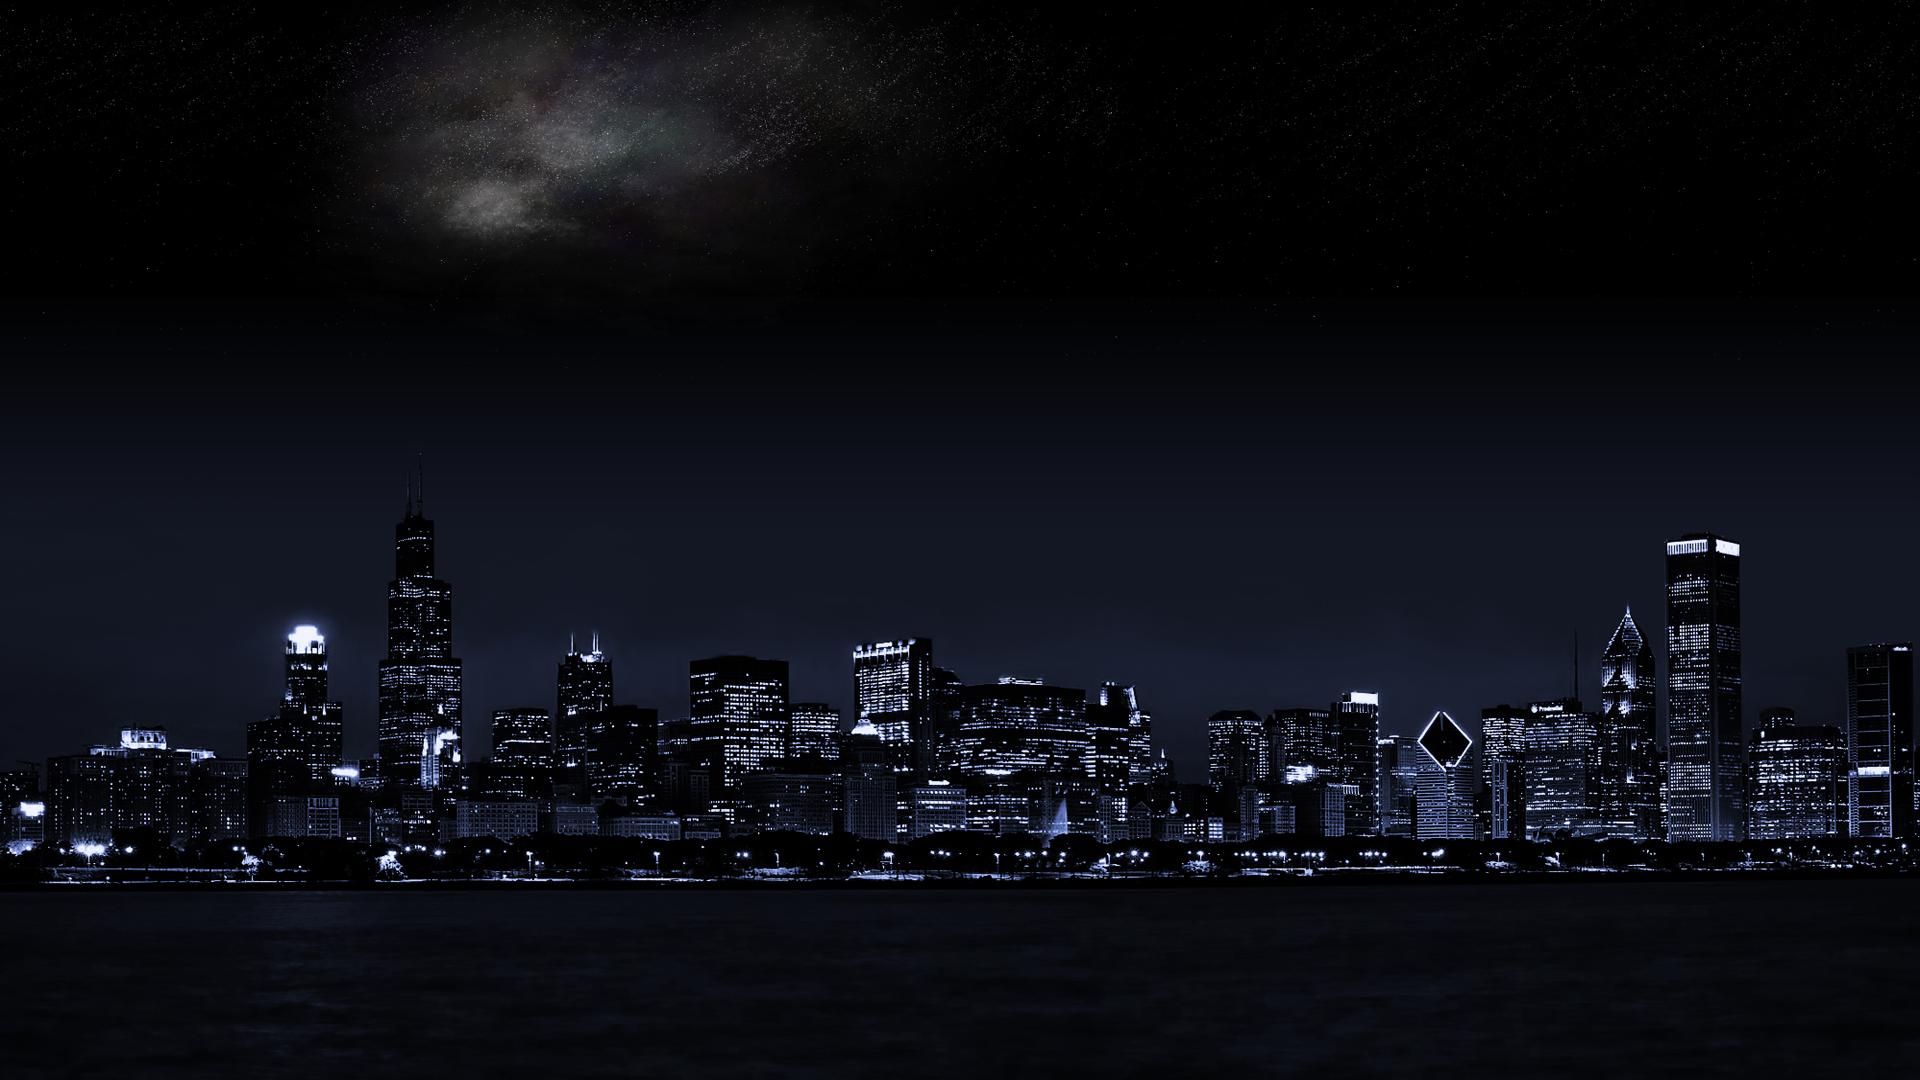 Wallpaper Cityscape Chicago City Urban Skyline Night